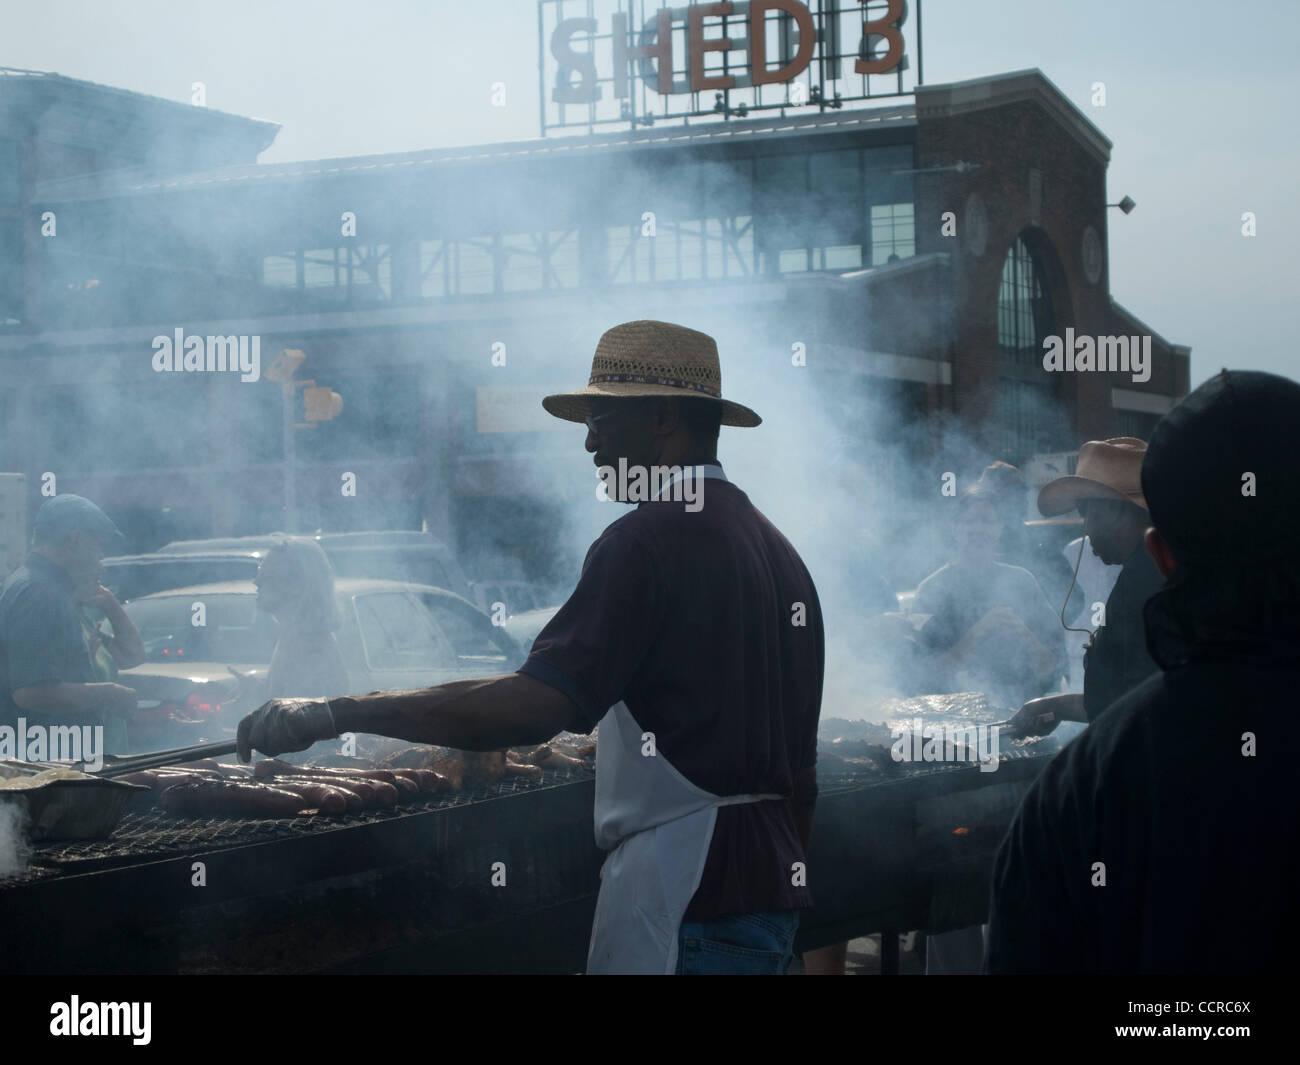 Detroit Chef Stock Photos & Detroit Chef Stock Images - Alamy